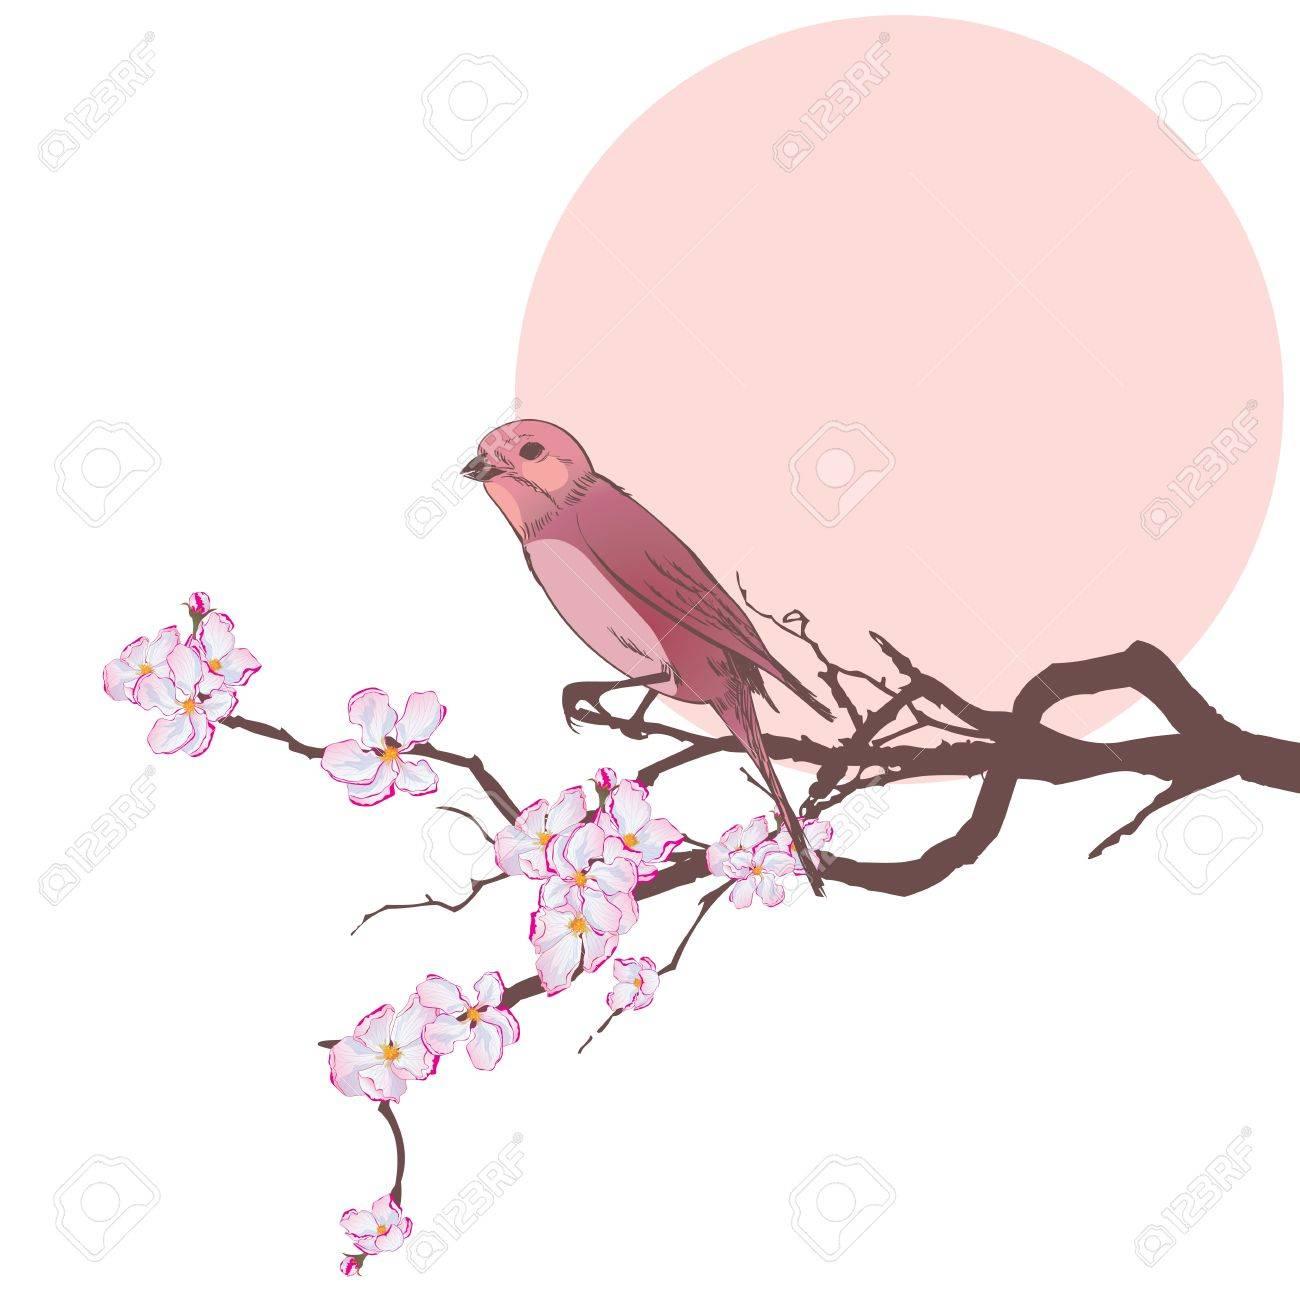 vector illustration of bird on the branch of cherry tree   EPS 10 Stock Vector - 17603492